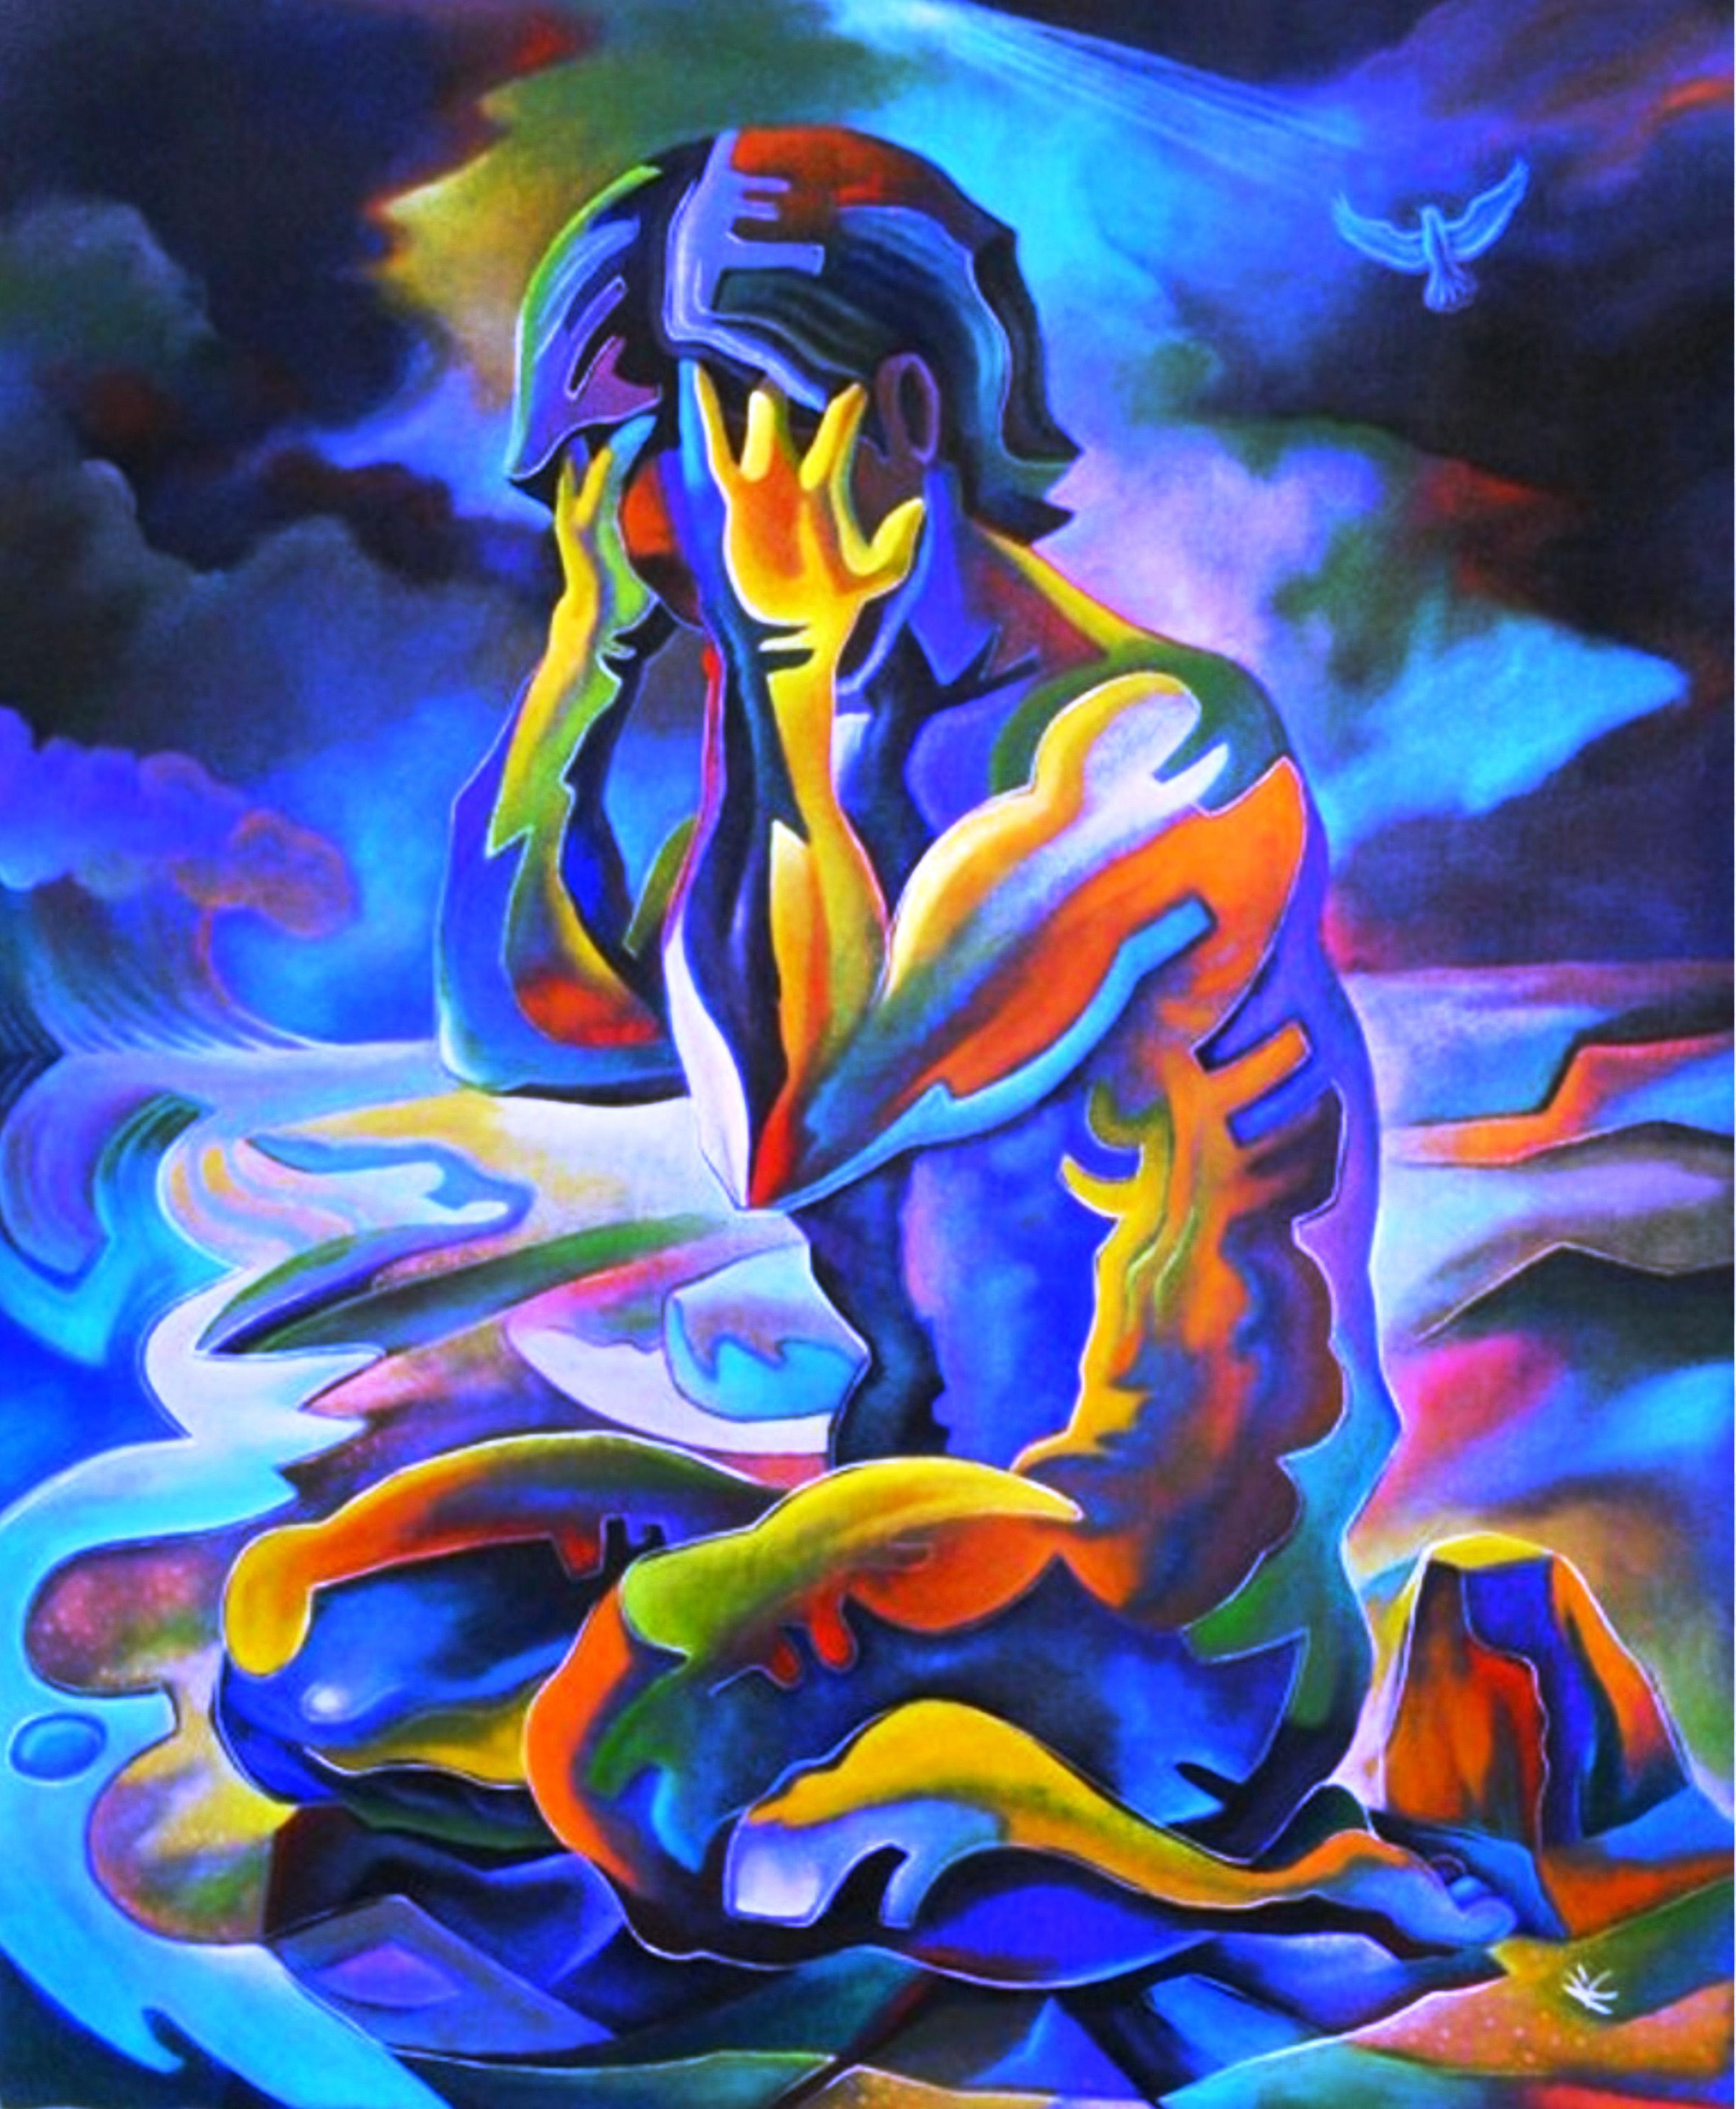 PREMONITION artwork by Alan Kent - art listed for sale on Artplode